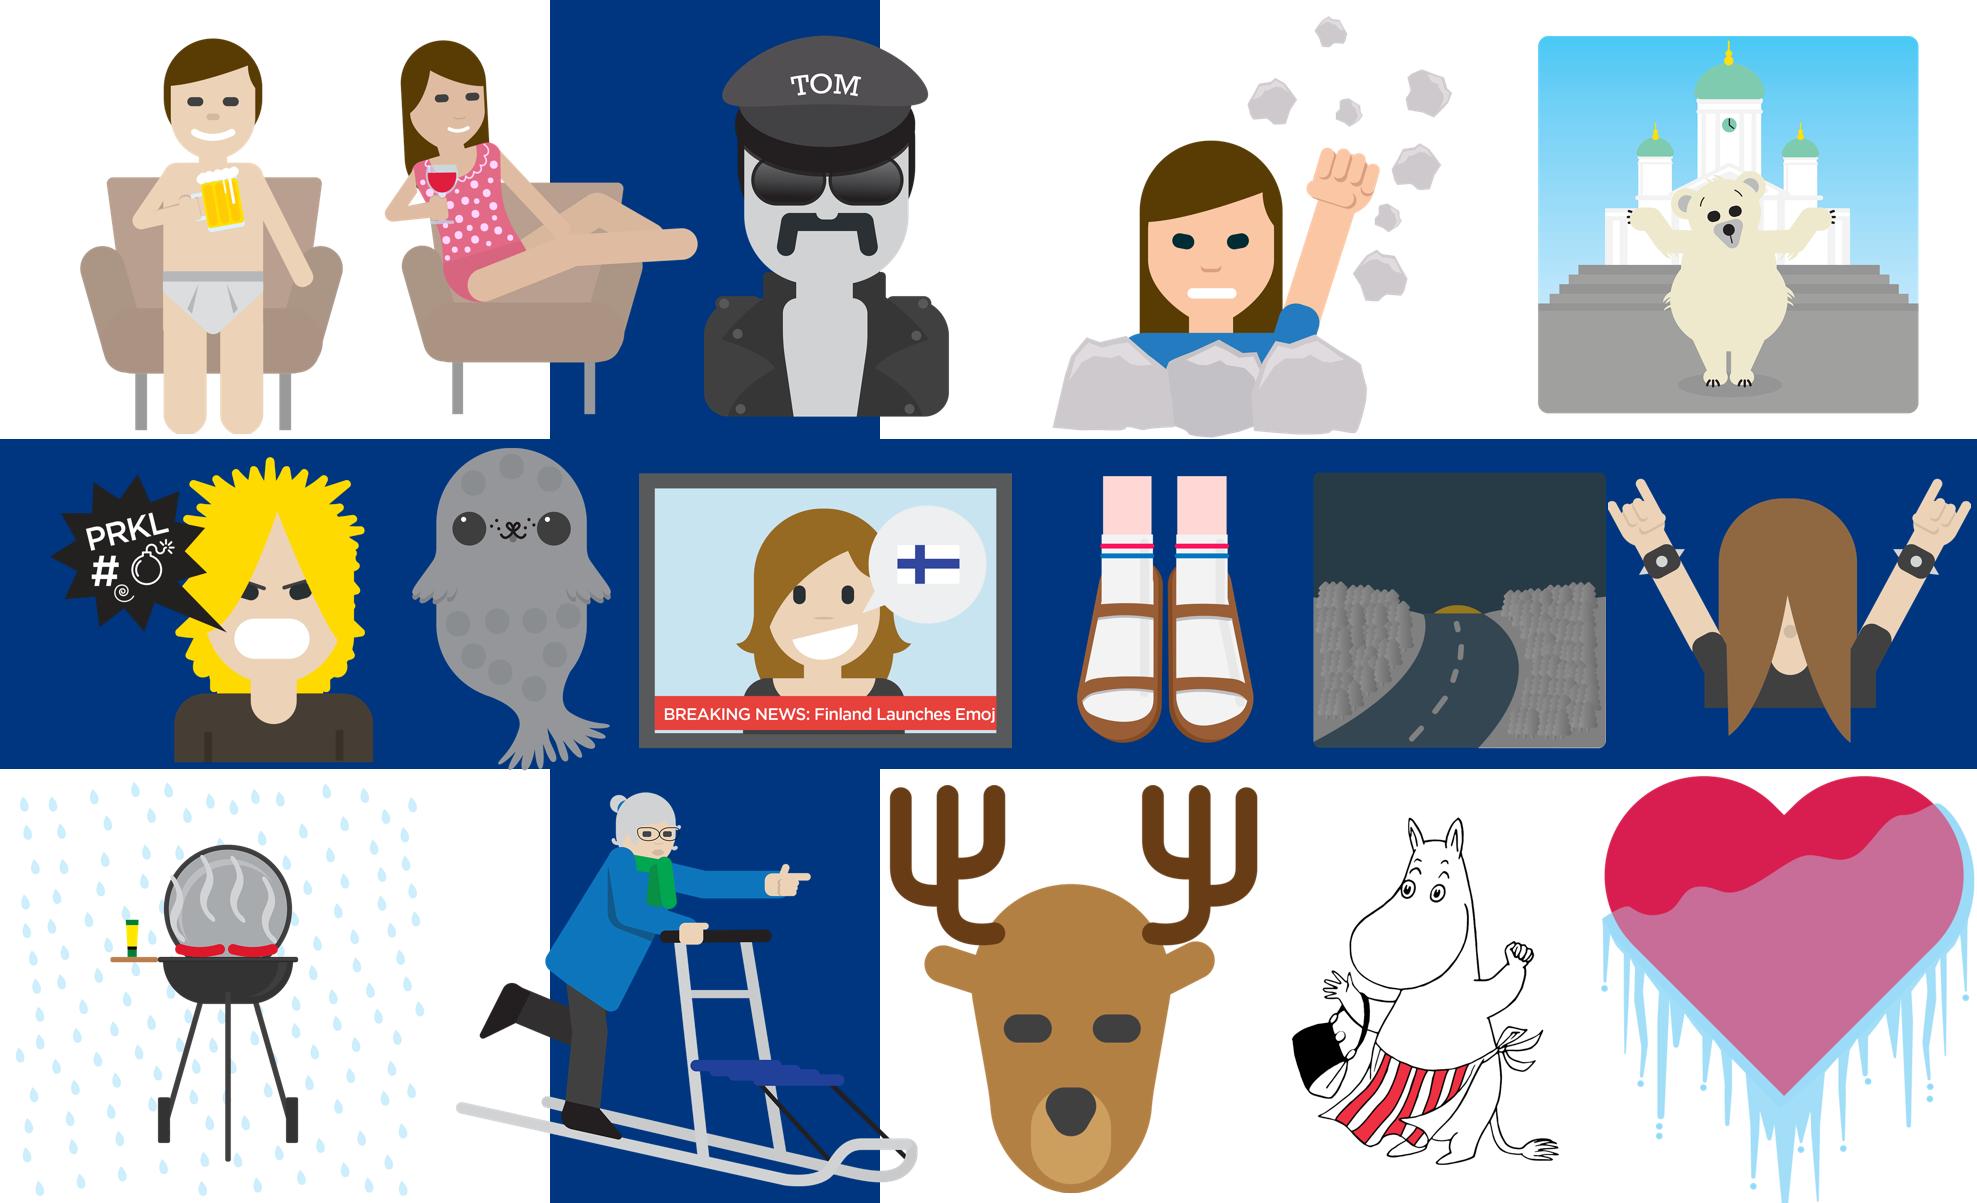 Behold, Finland's national emojis